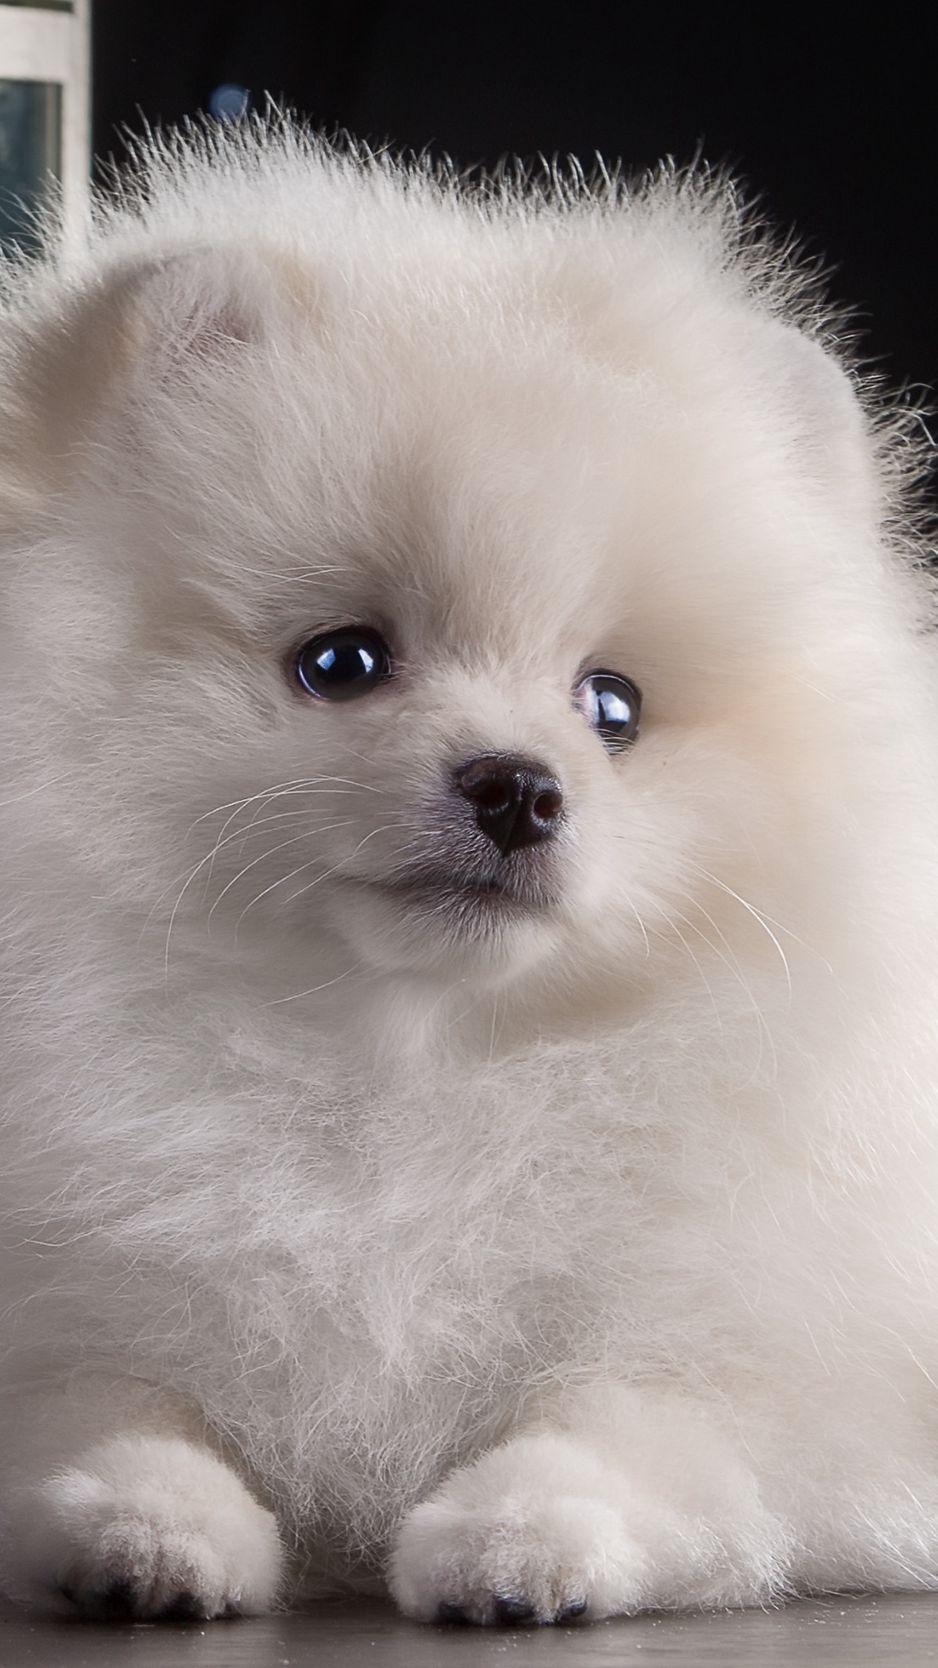 Pin By Dasha Gudim On Animals Puppies Puppy Wallpaper Iphone Dog Wallpaper Hd wallpaper pomeranian dog animal pet